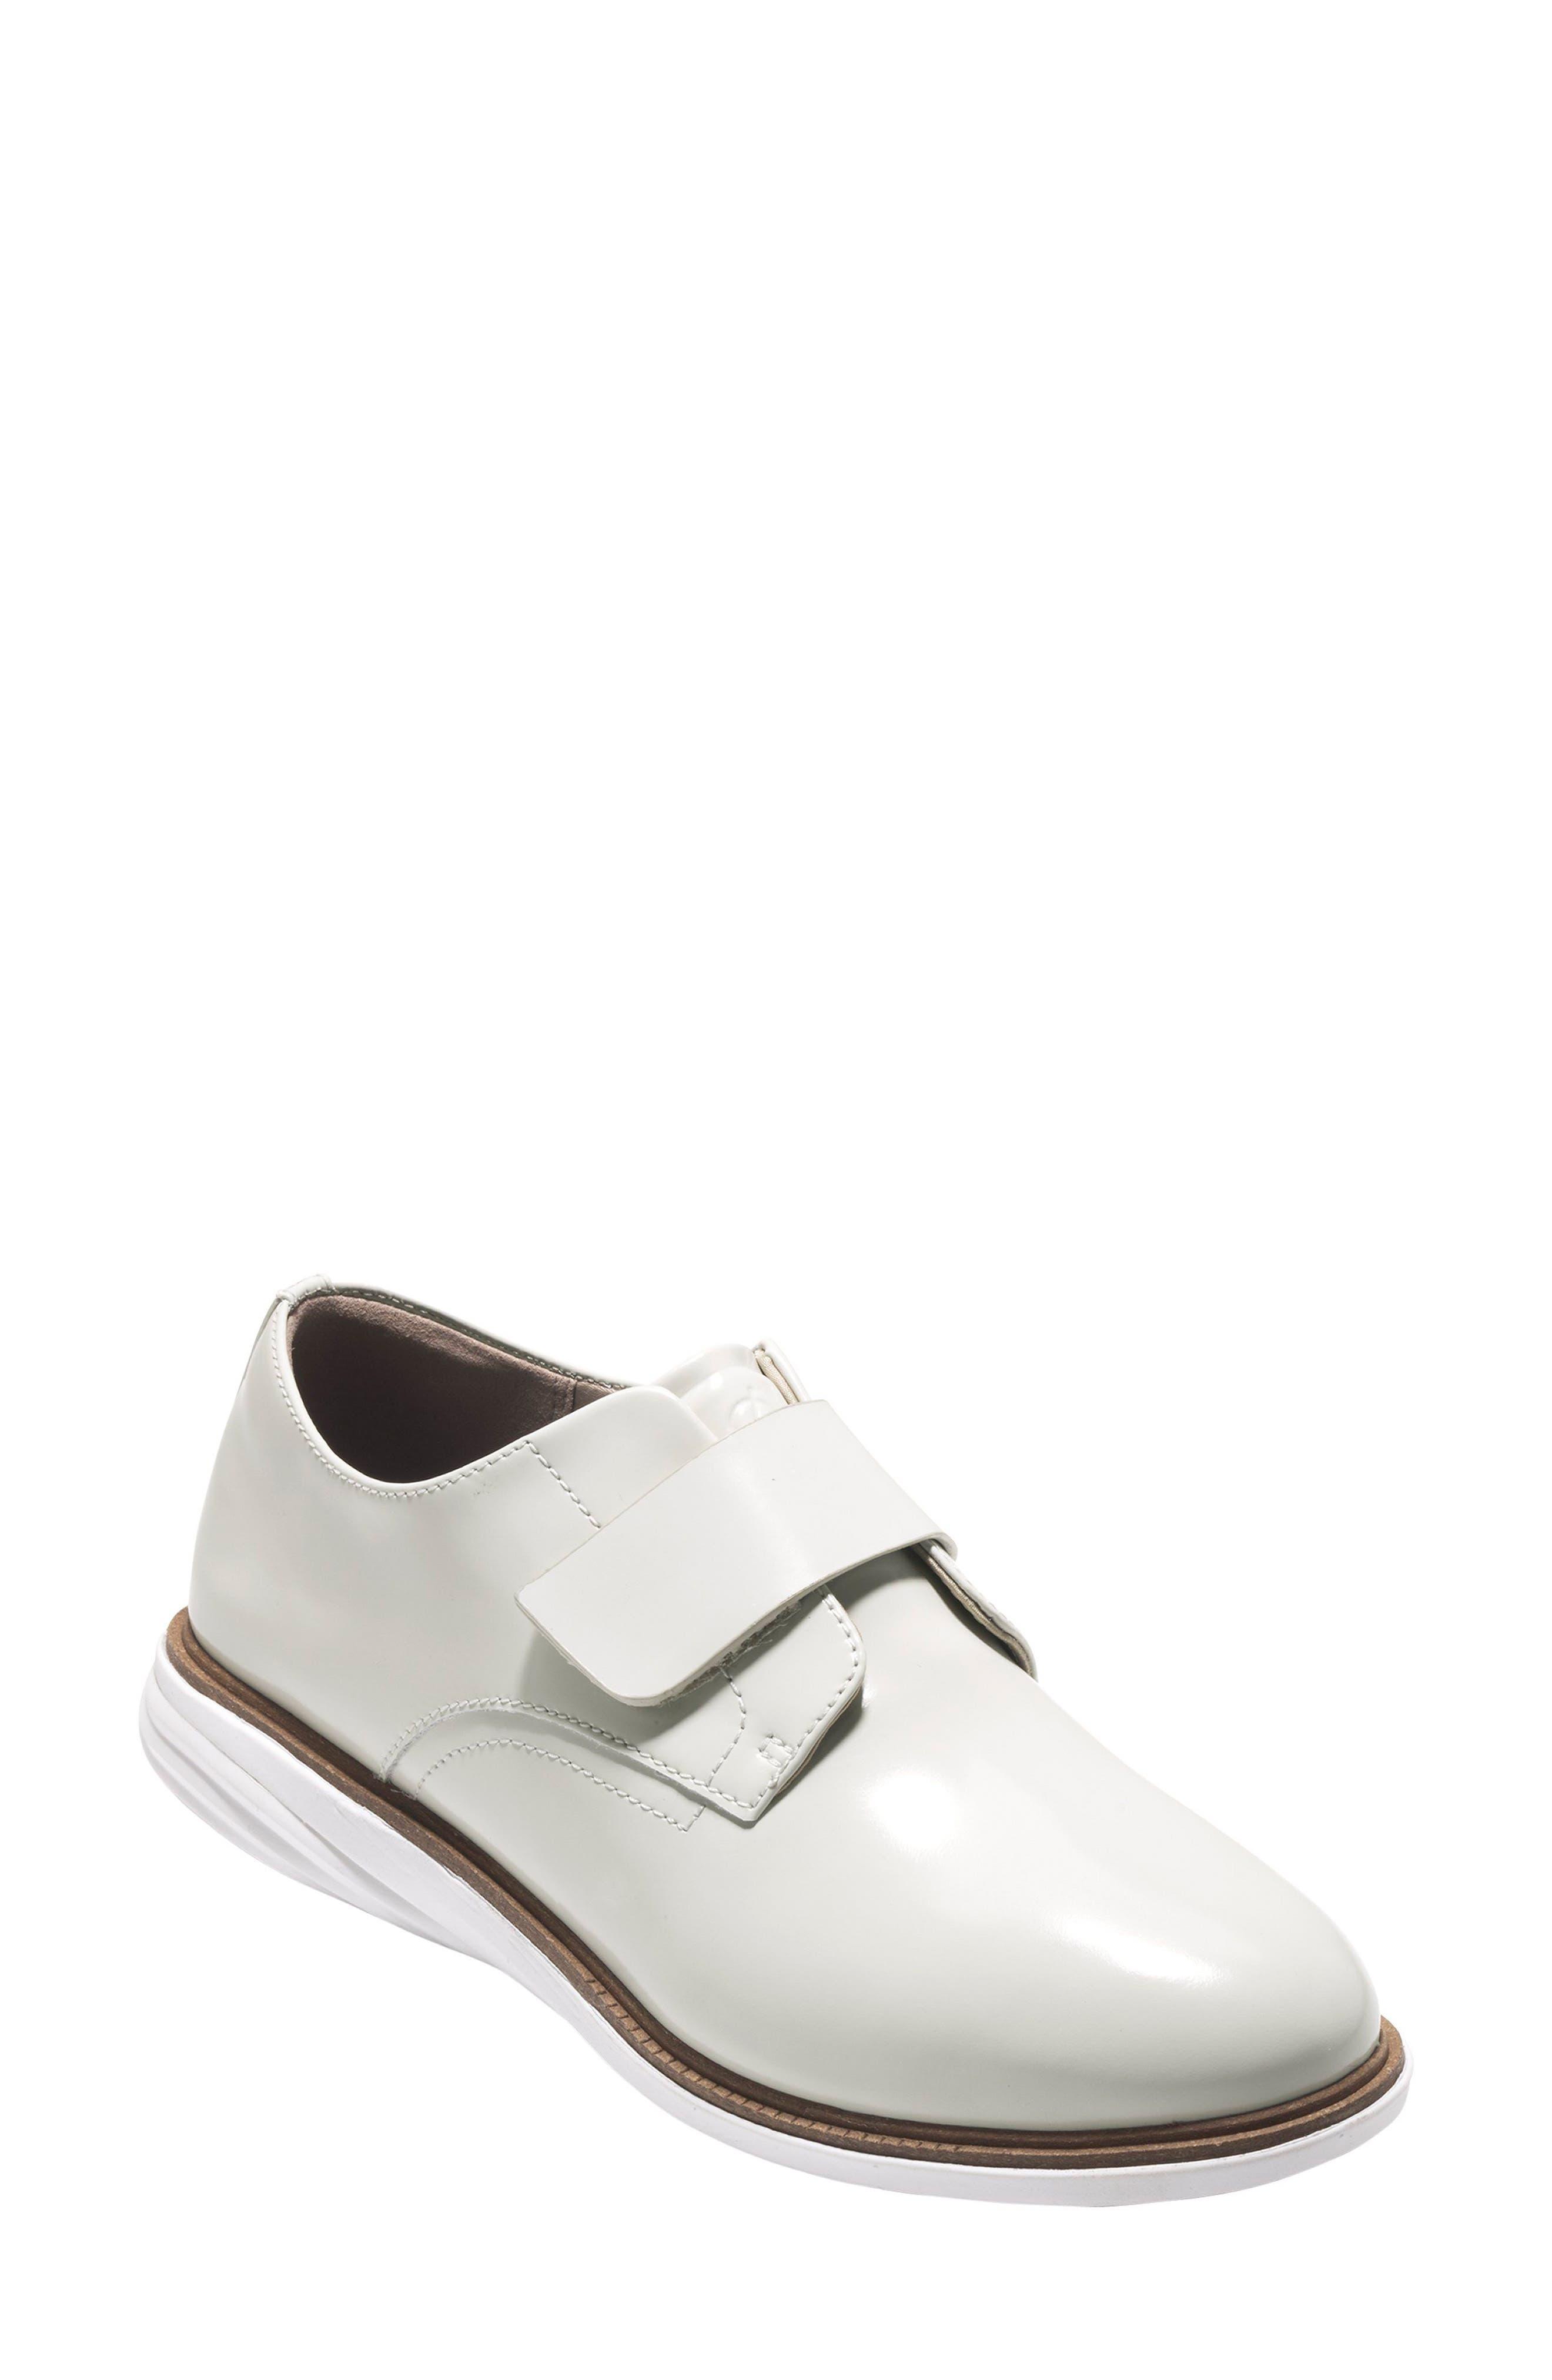 Grandevolution Oxford Sneaker,                             Main thumbnail 1, color,                             Optic White Leather